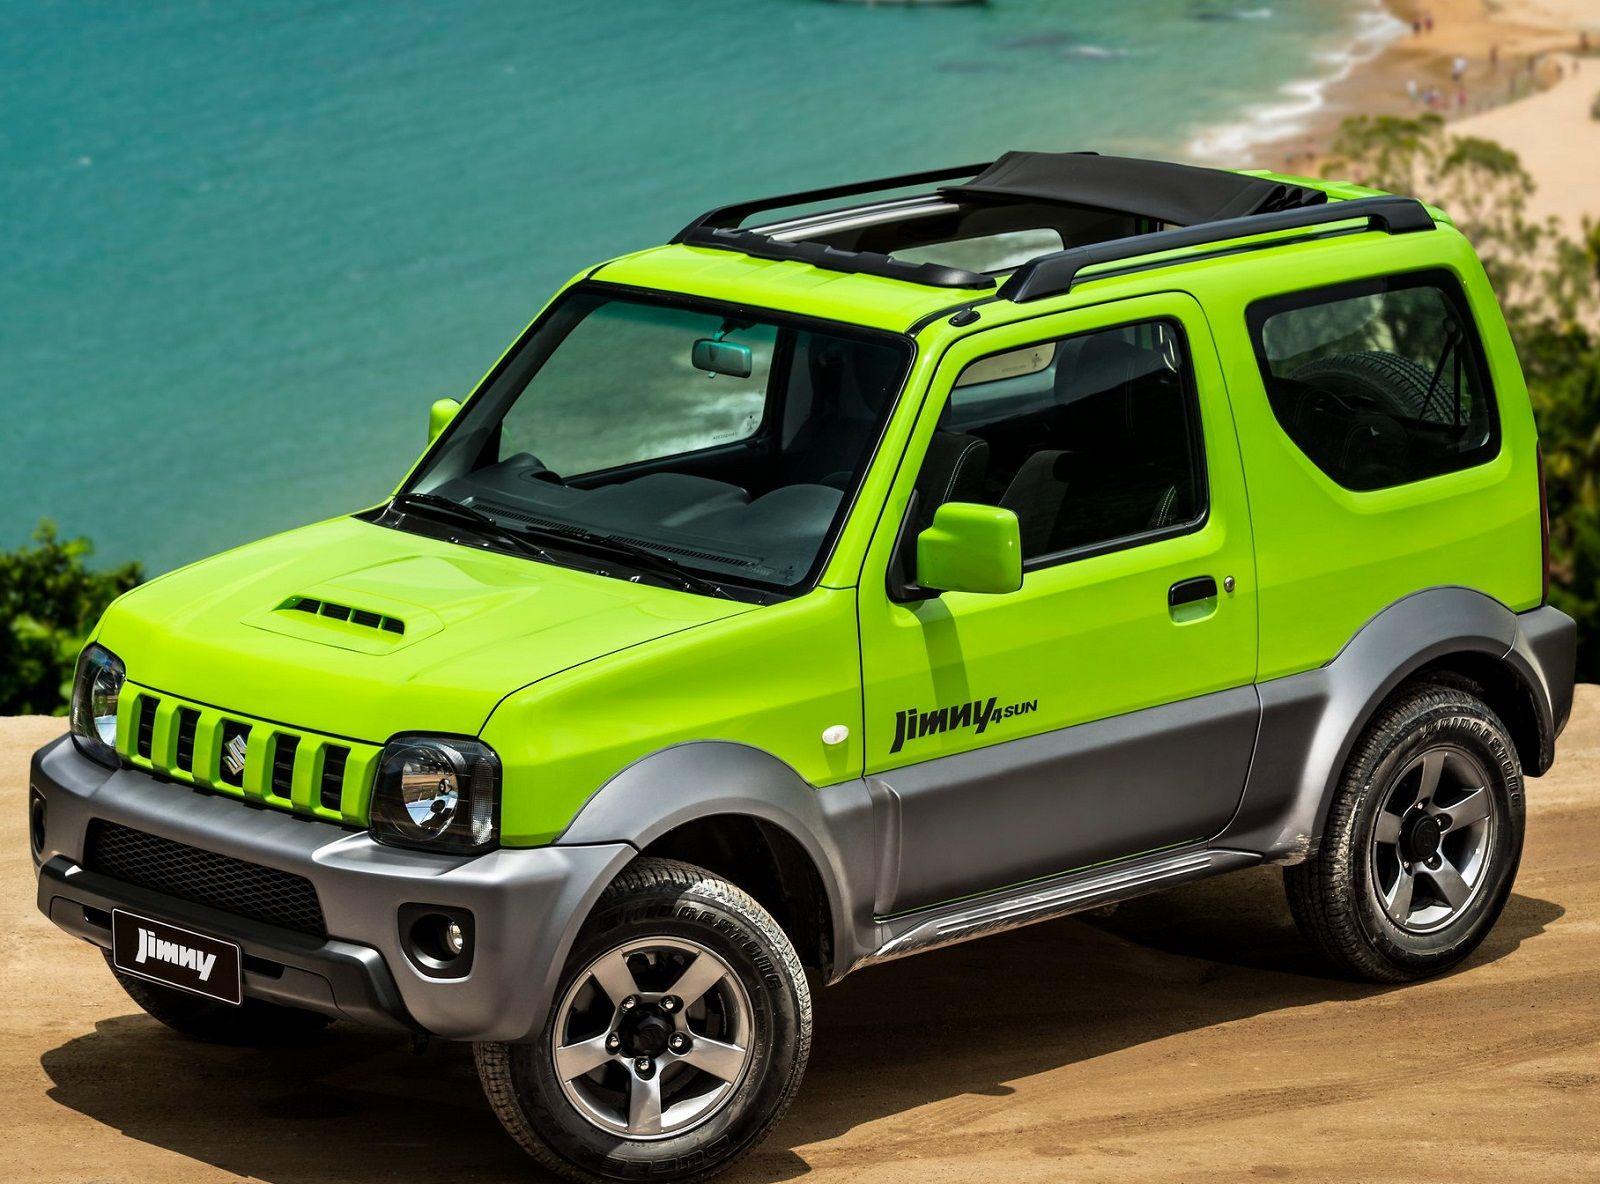 2020 Suzuki Jimny Model Suzuki jimny, Suzuki jimny 2015